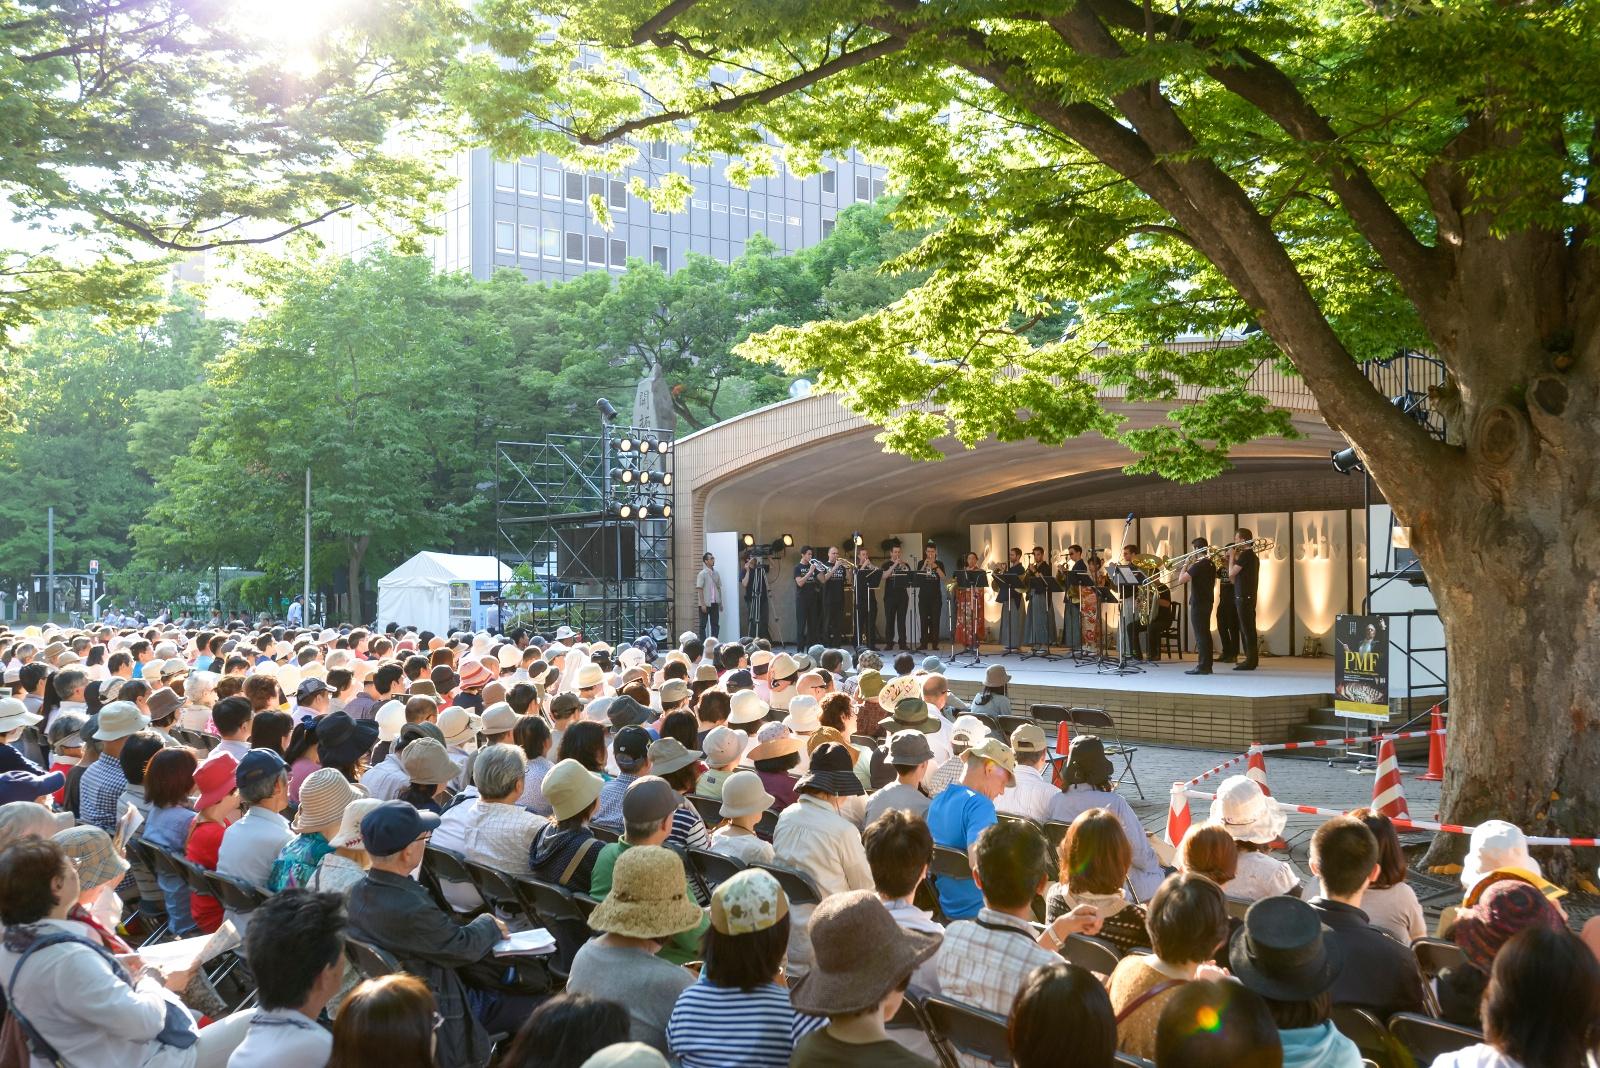 PMFは誰でも気軽に楽しめます!札幌で行われる無料コンサートをご紹介!